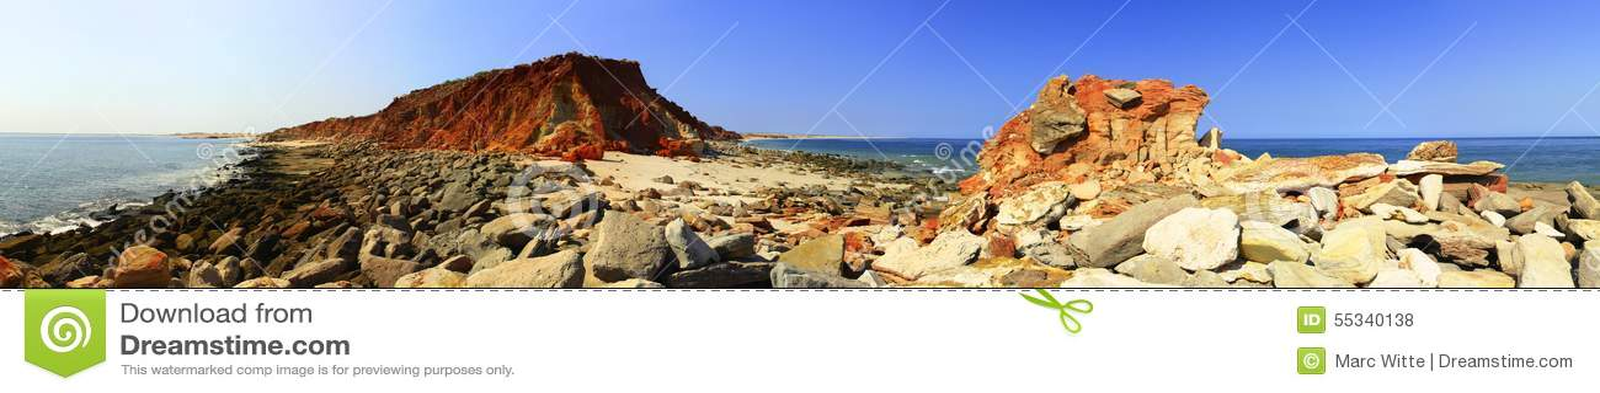 Przylądek Leveque blisko Broome, zachodnia australia